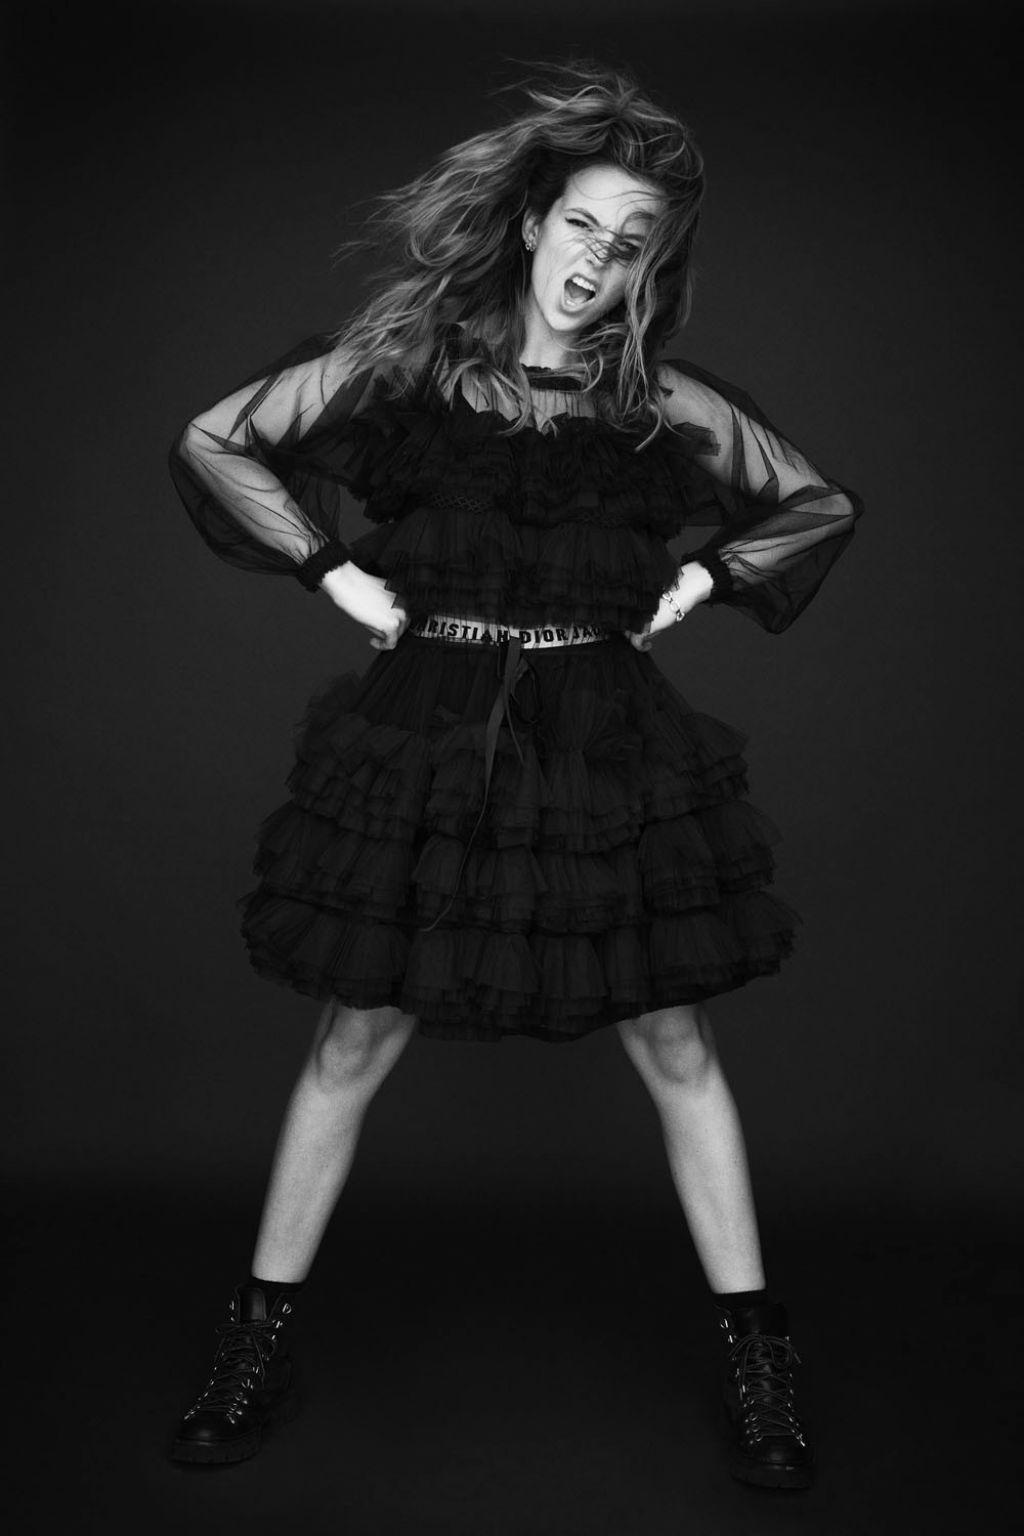 Jodie Comer Photoshoot For Wonderland Magazine The